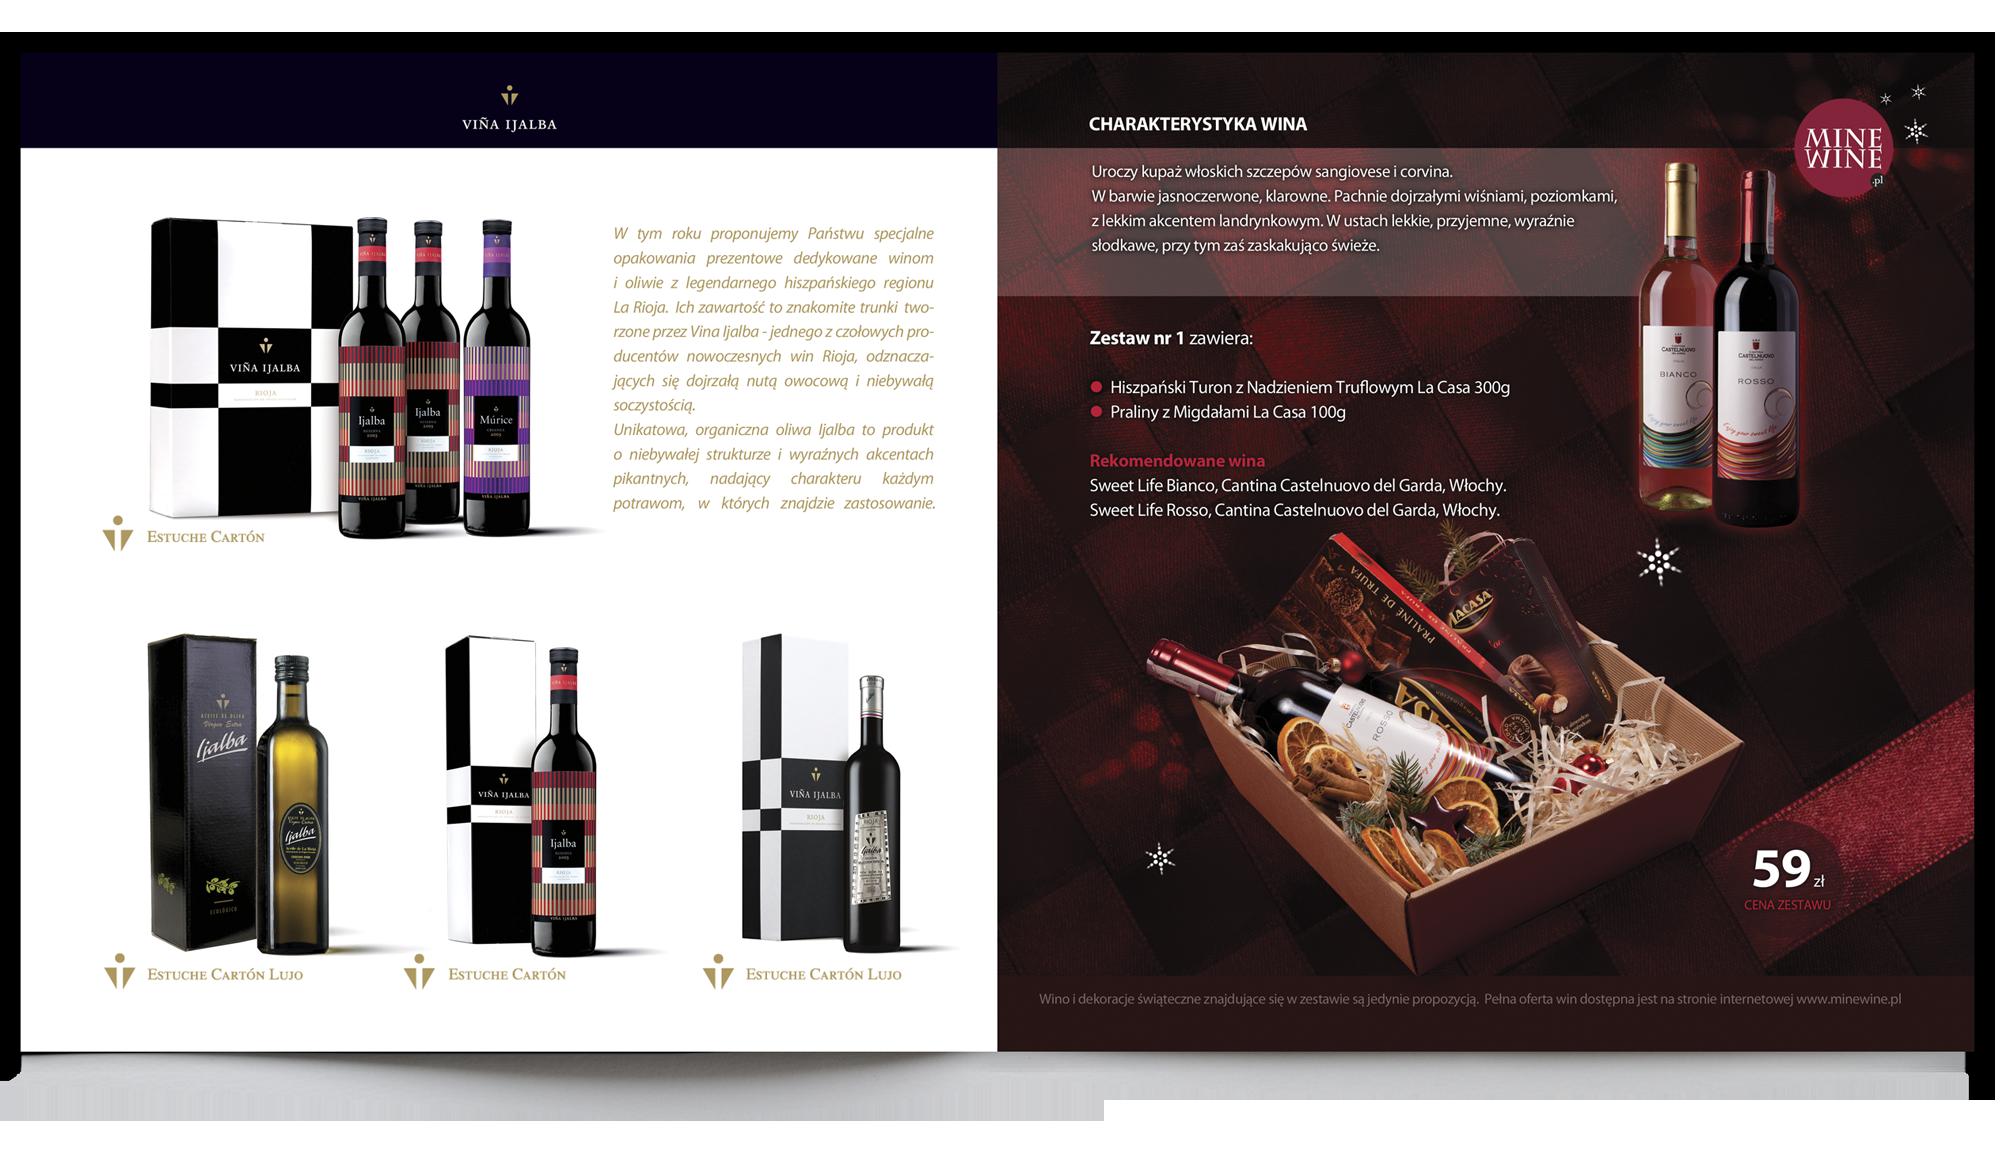 projekty graficzne, design newspaper, ilustracja, concept art, key visual, minewine, designer Ireneusz Bloch